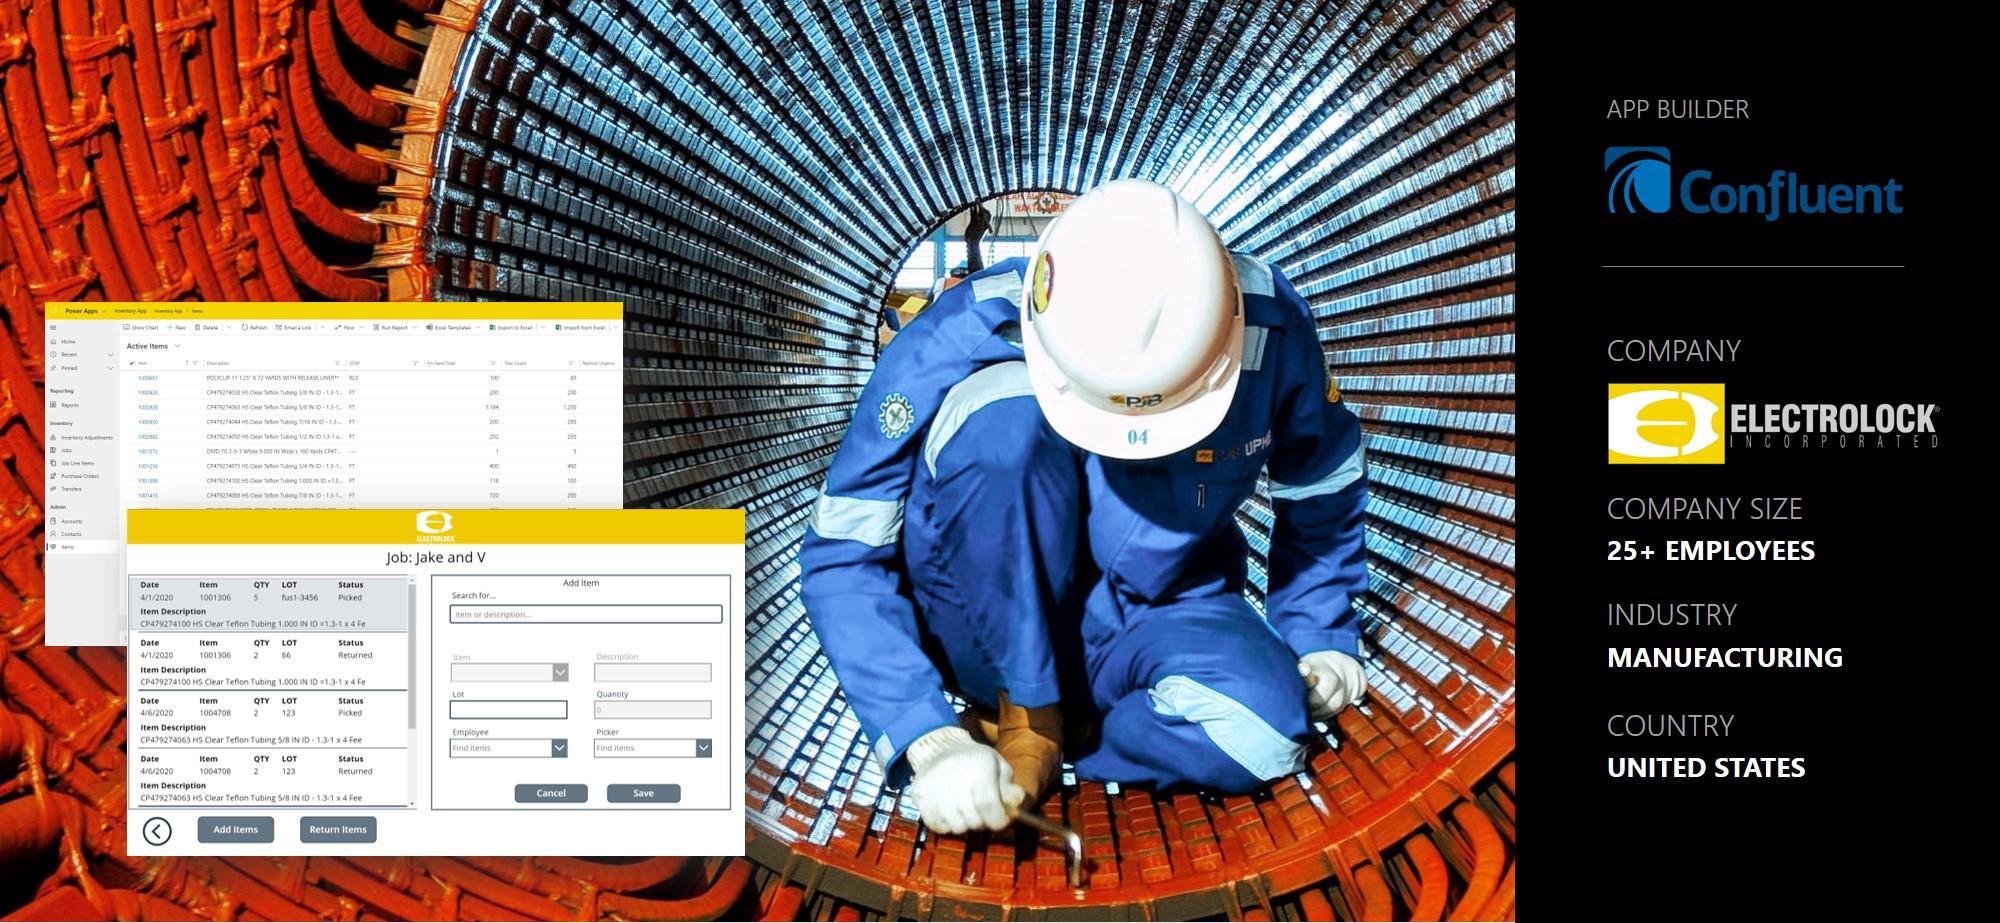 Electrolock ERP Management Application